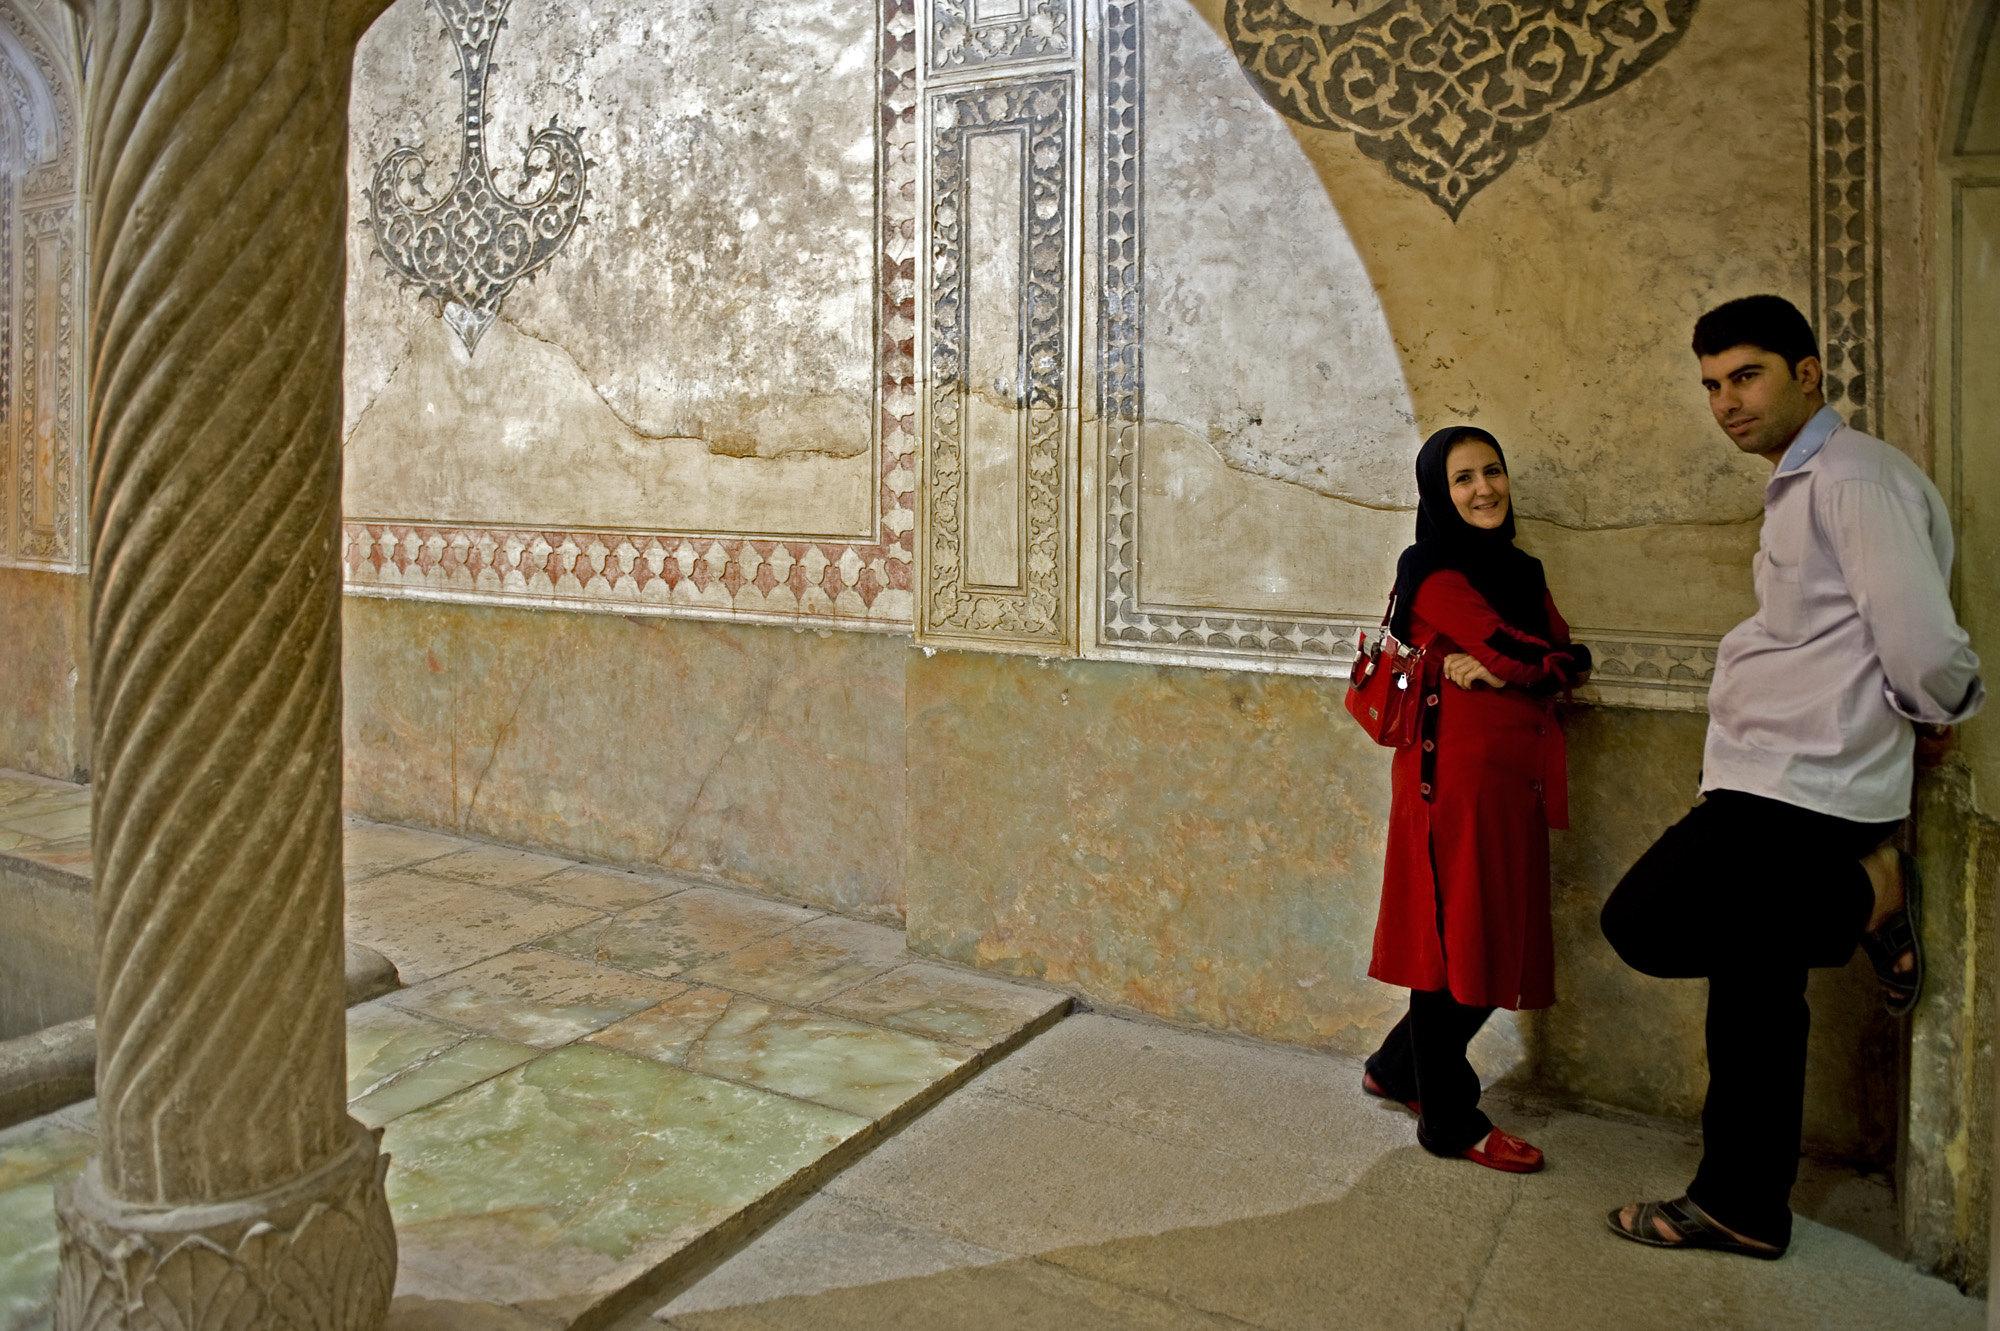 卡里姆汗古城堡  Citadel of Karim Khan   -1